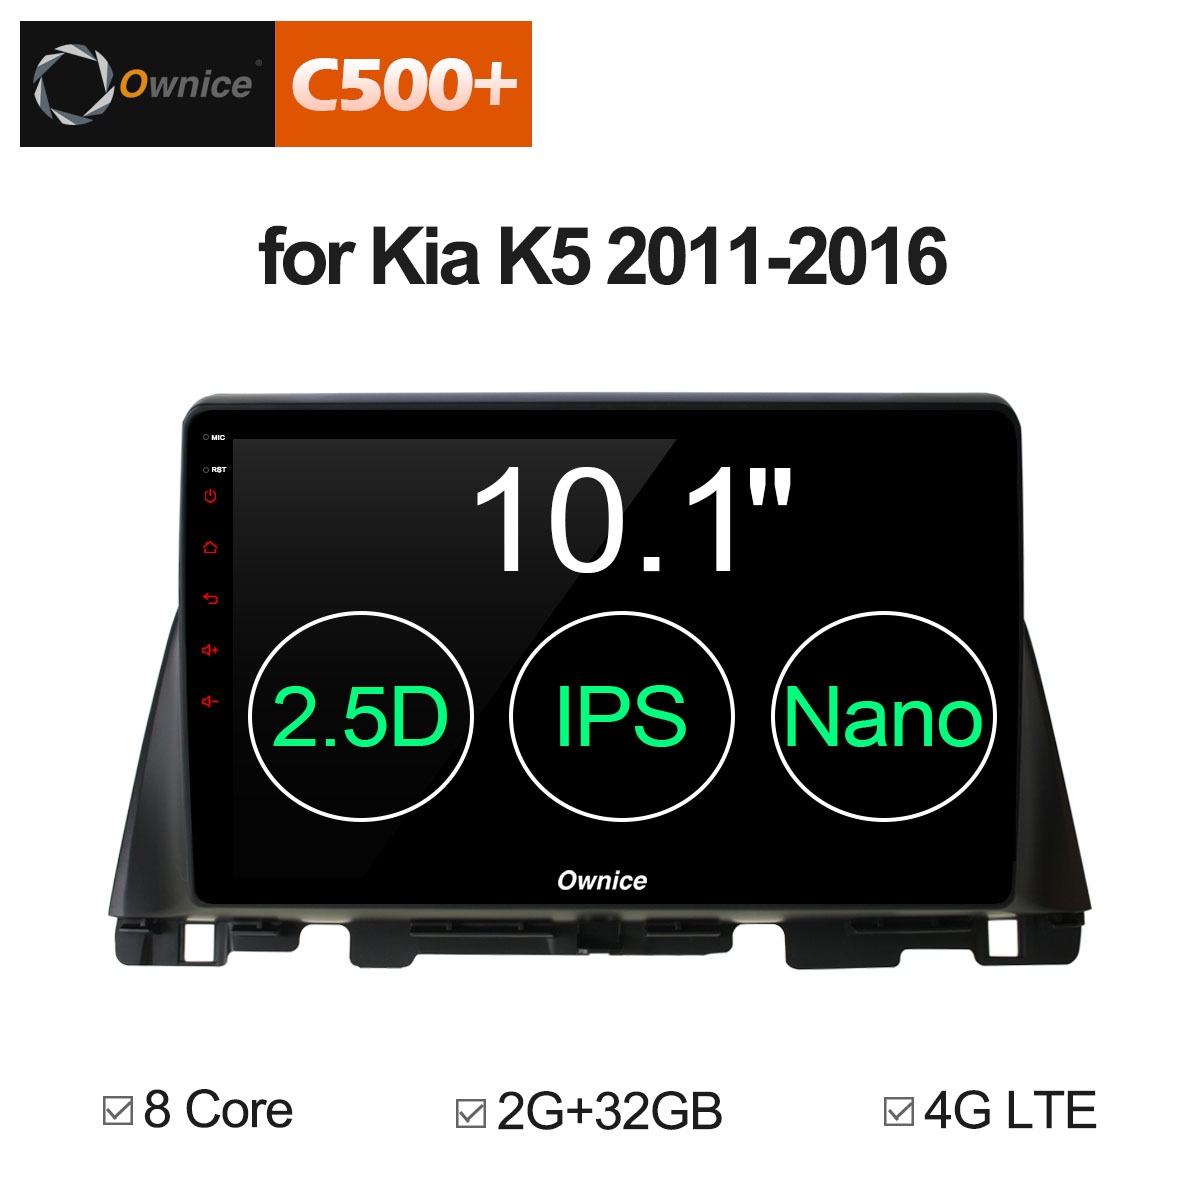 Ownice G10 C500+ 10.1 Android 8.1 8 Core 2G+32G for KIA K5 optima 2011 - 2016 Car DVD Navi GPS Radio player Vehicle 4G ownice c500 4g sim lte octa 8 core android 6 0 for kia ceed 2013 2015 car dvd player gps navi radio wifi 4g bt 2gb ram 32g rom